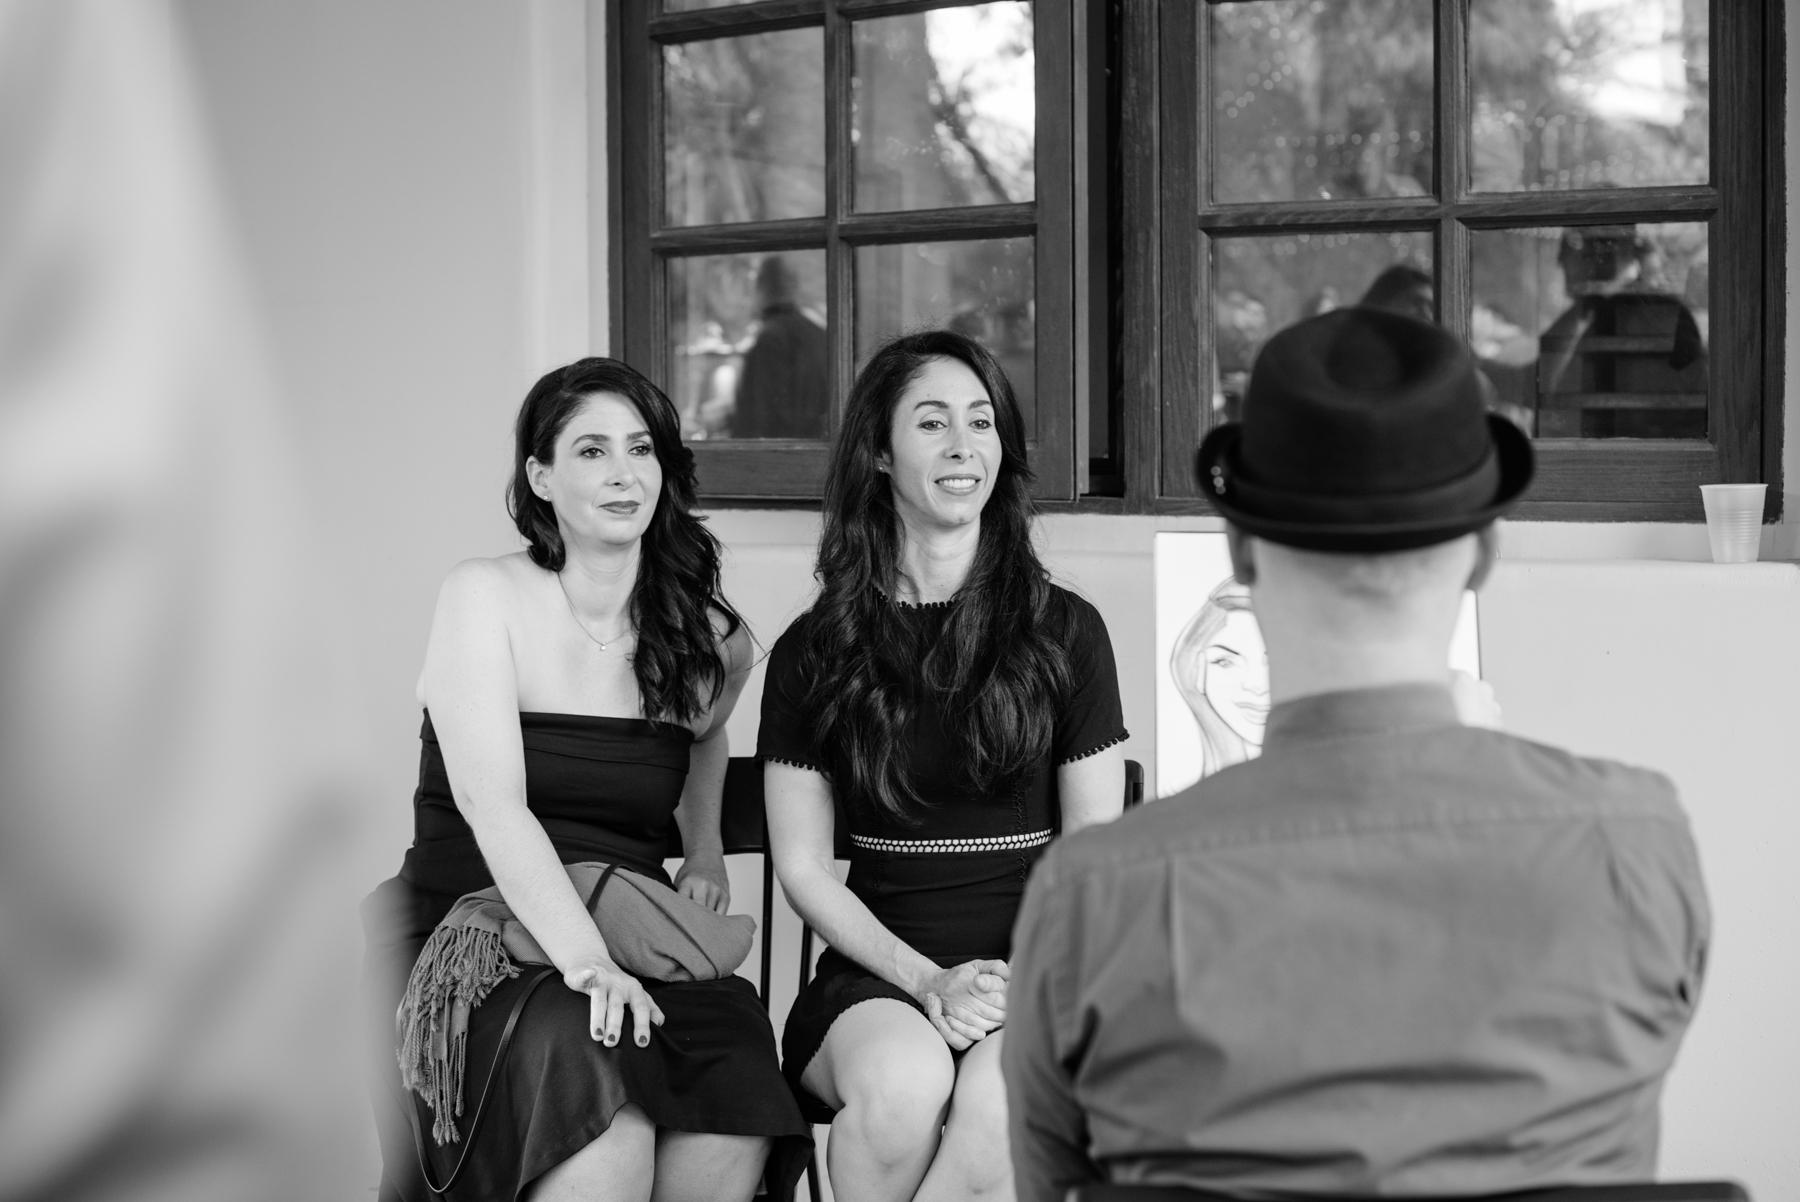 Secret Garden Event Center Wedding - Meredith Amadee Photography-7-2.jpg